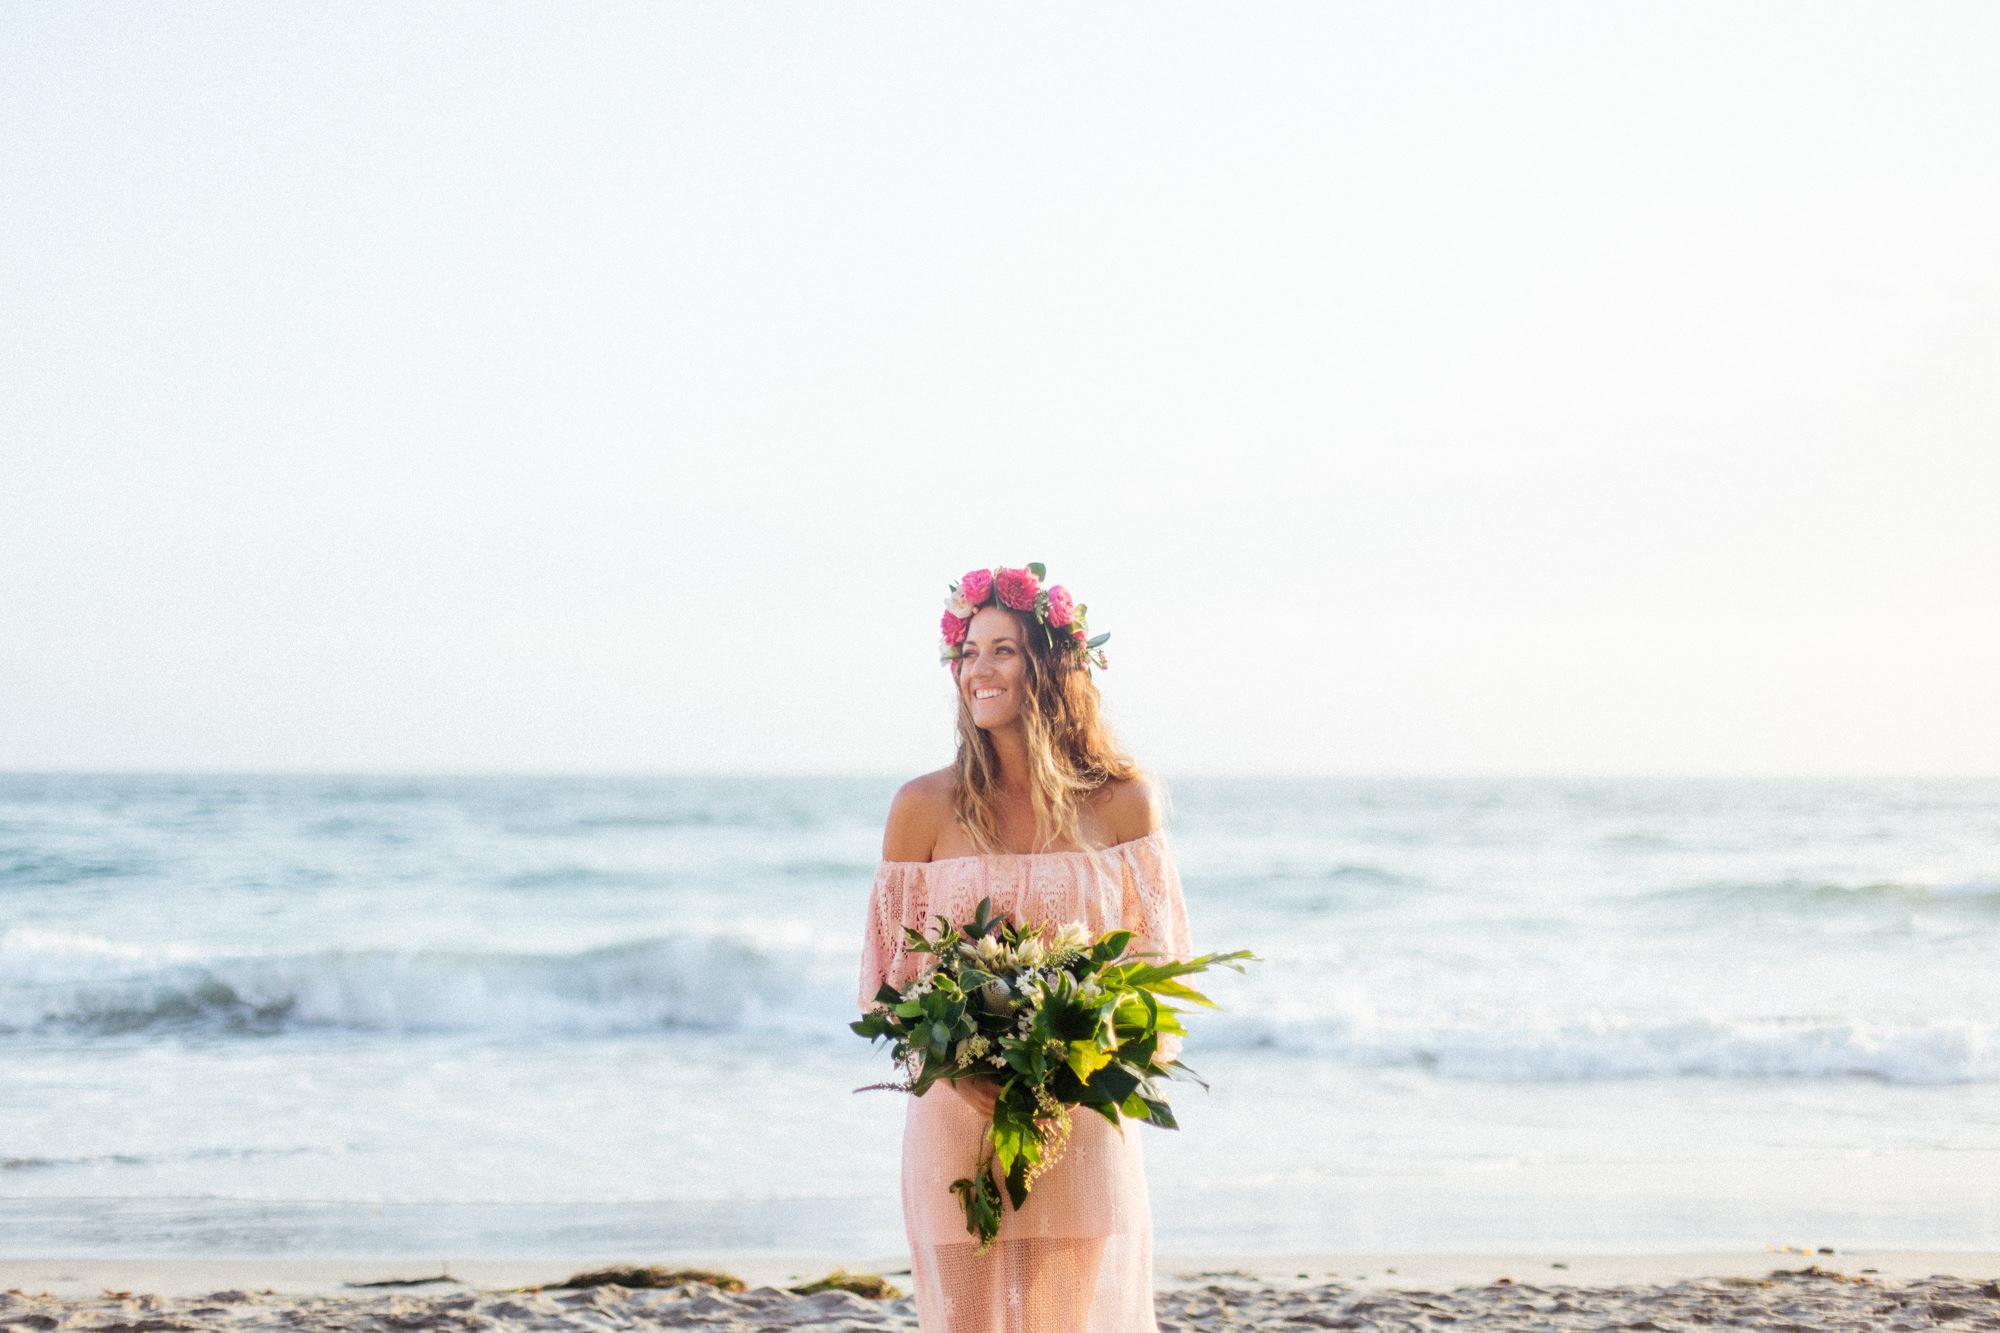 San Diego Wedding photography at Cardiff Beach036.jpg